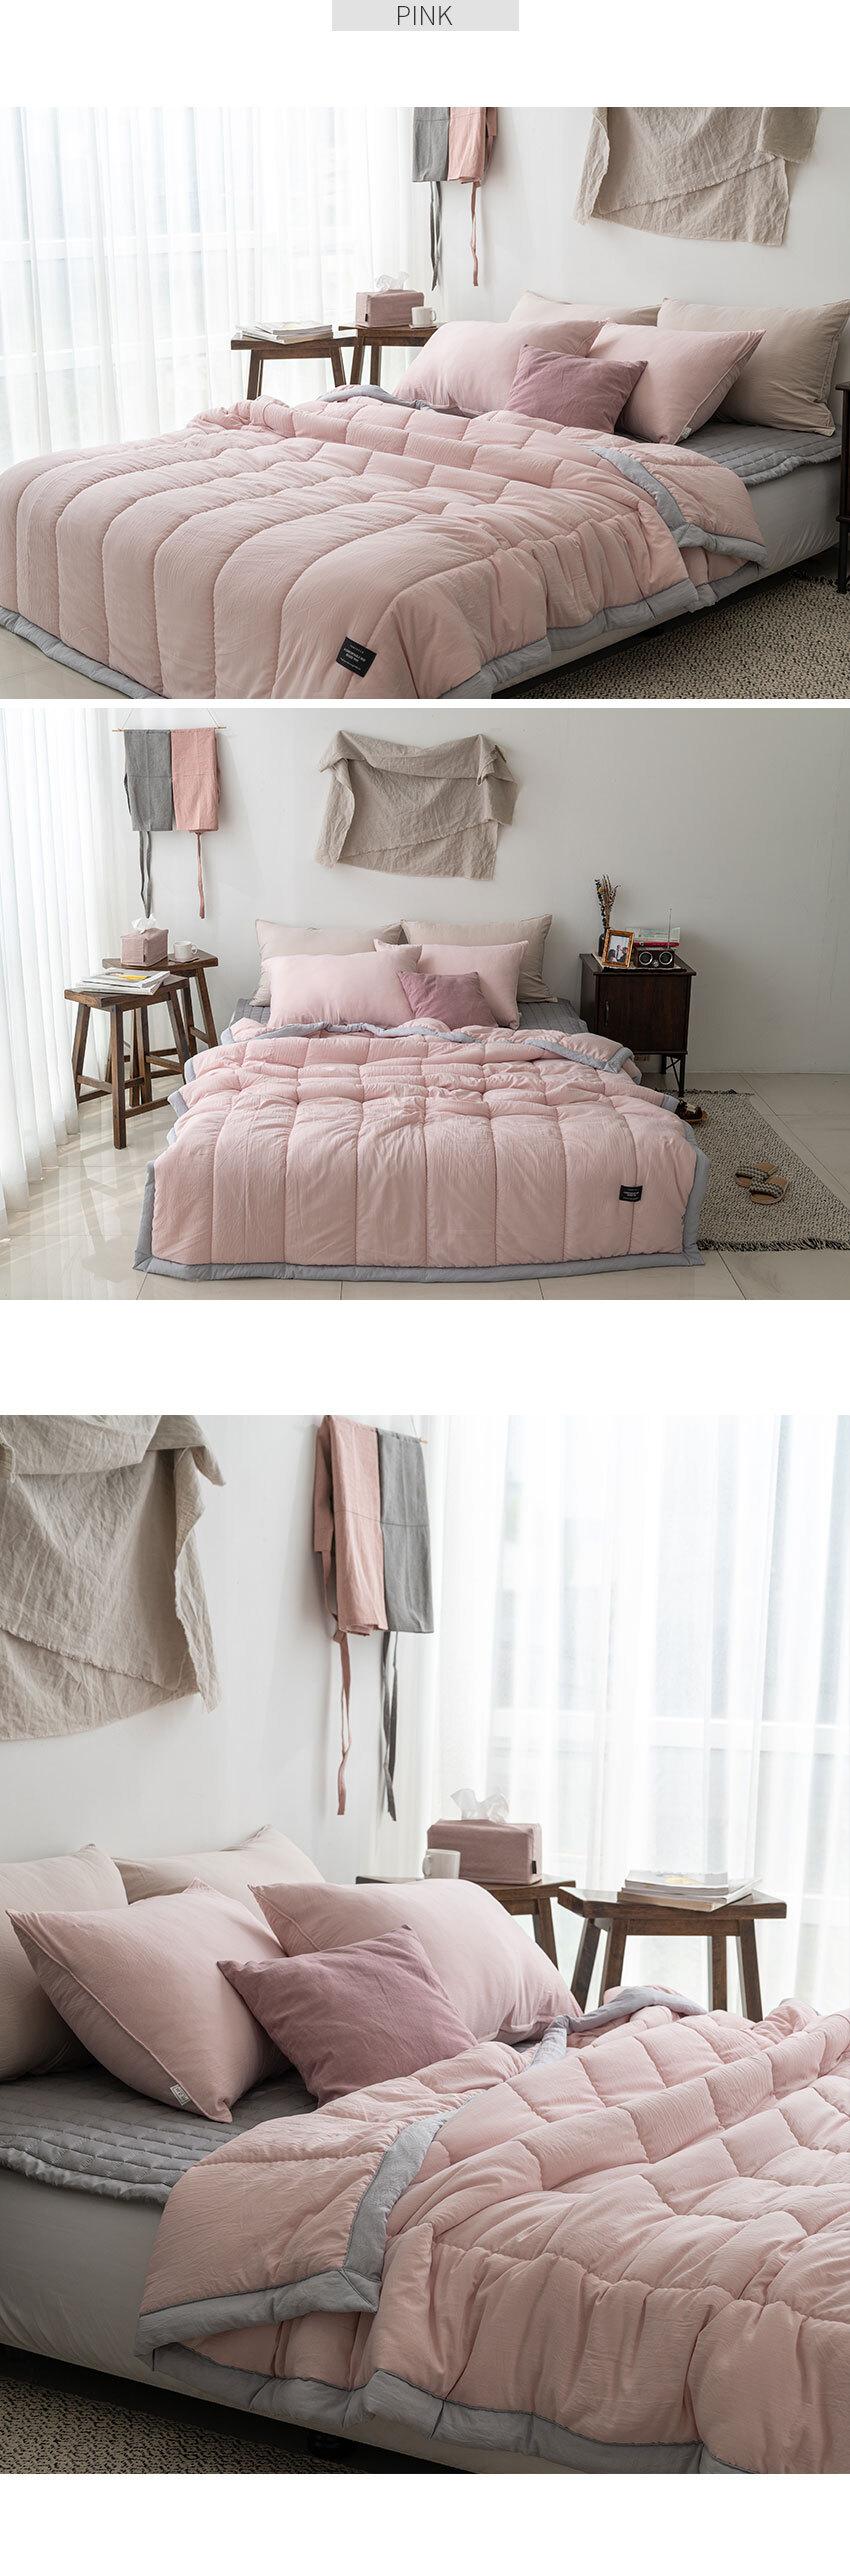 labia_bed_pink.jpg